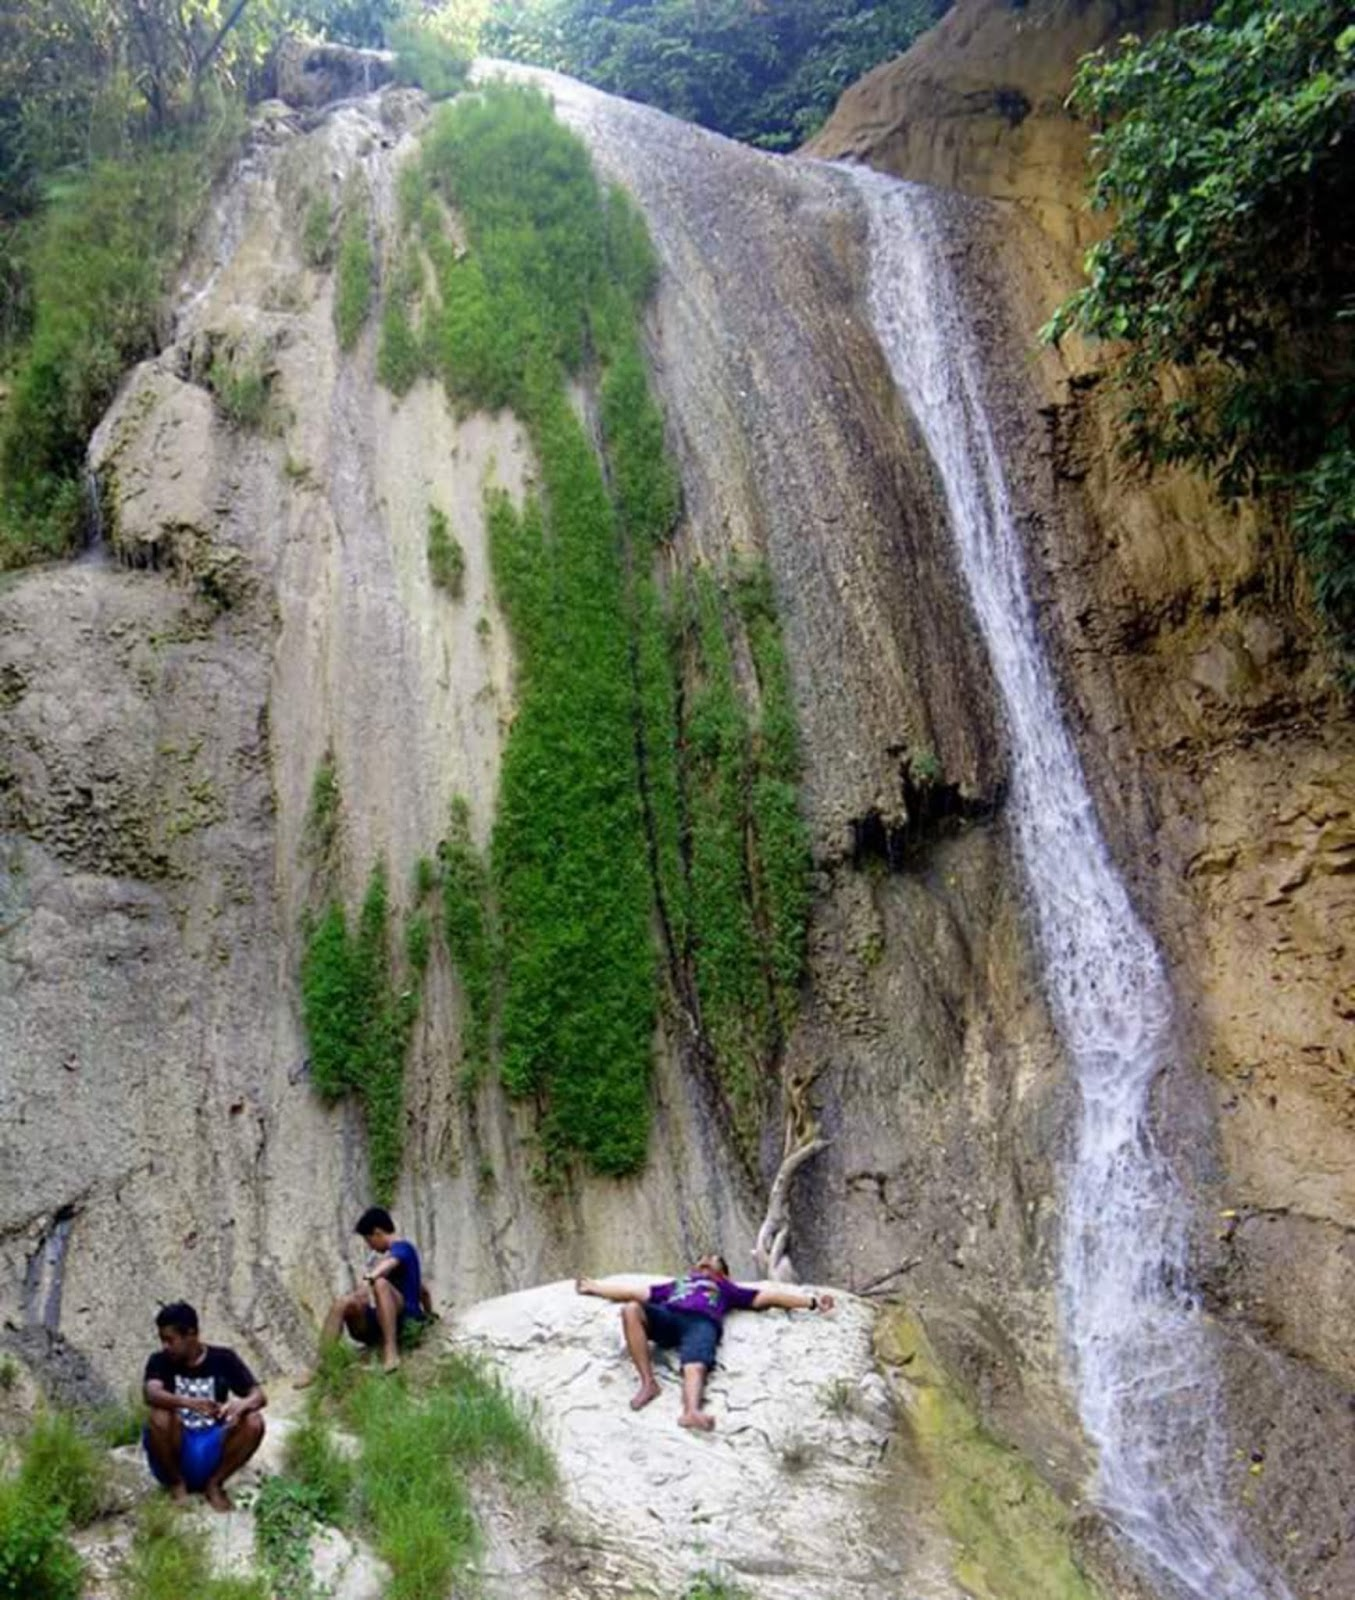 Eloknya 15 Tempat Wisata Bojonegoro Jawa Timur Trip Jalan Suarabojonegoro